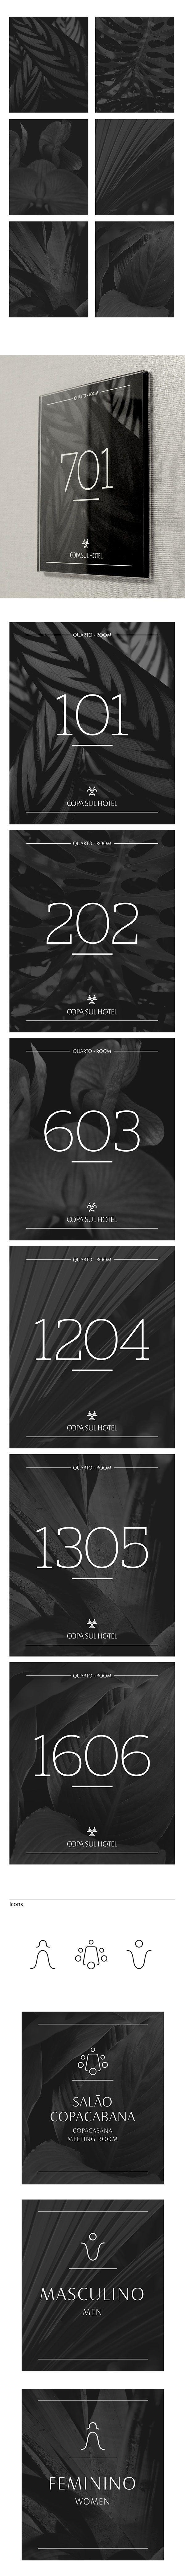 Copa Sul Hotel Signage by Studio Fernanda Schmidt on Behance